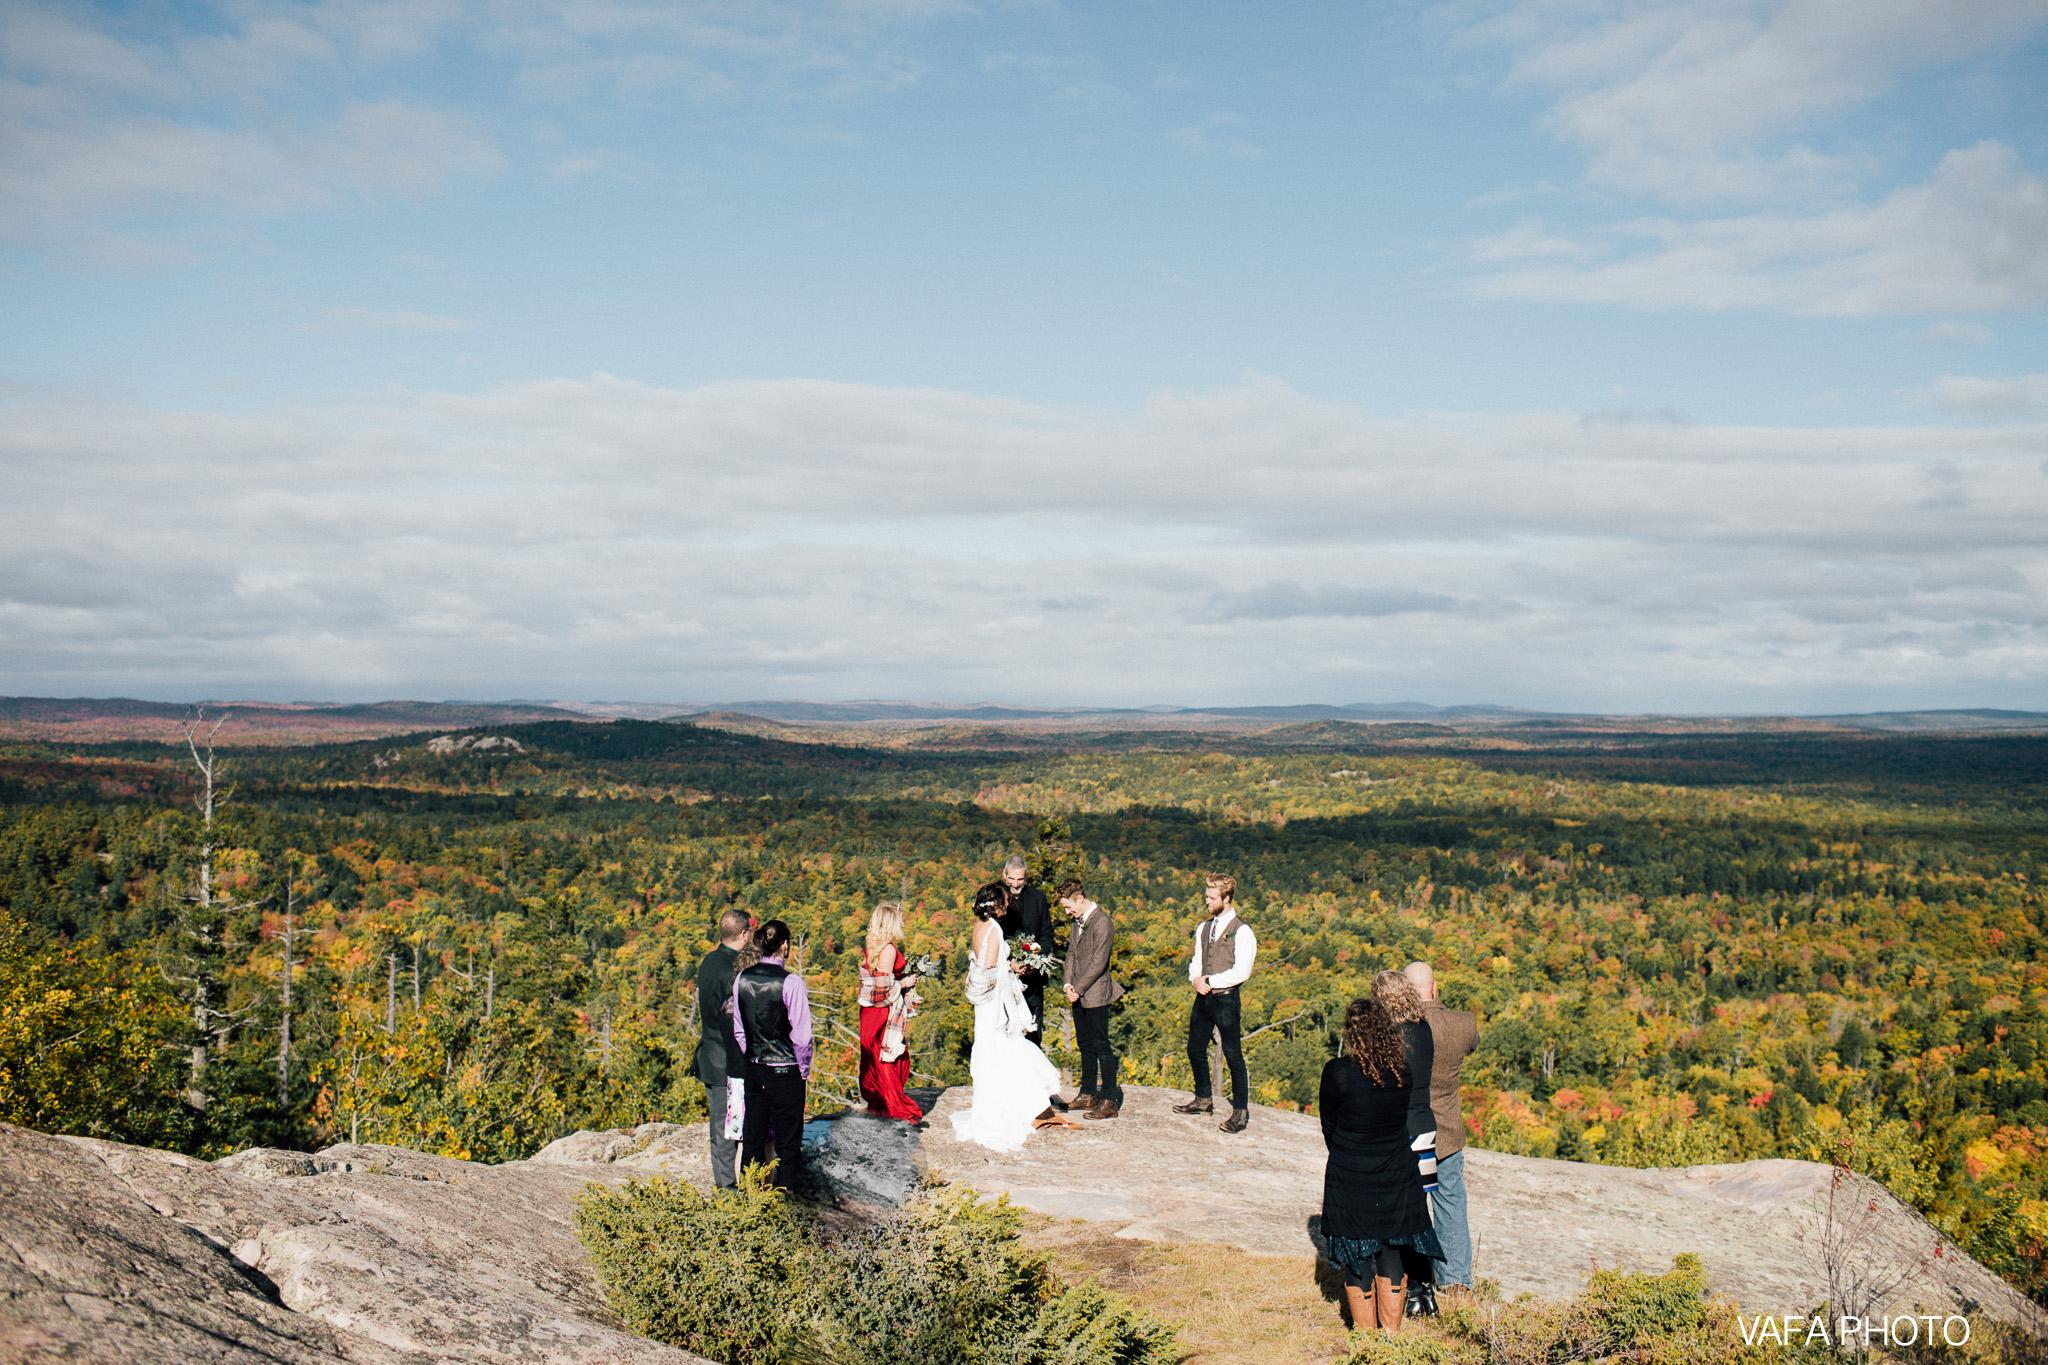 Hogback-Mountain-Wedding-Chelsea-Josh-Vafa-Photo-196.jpg